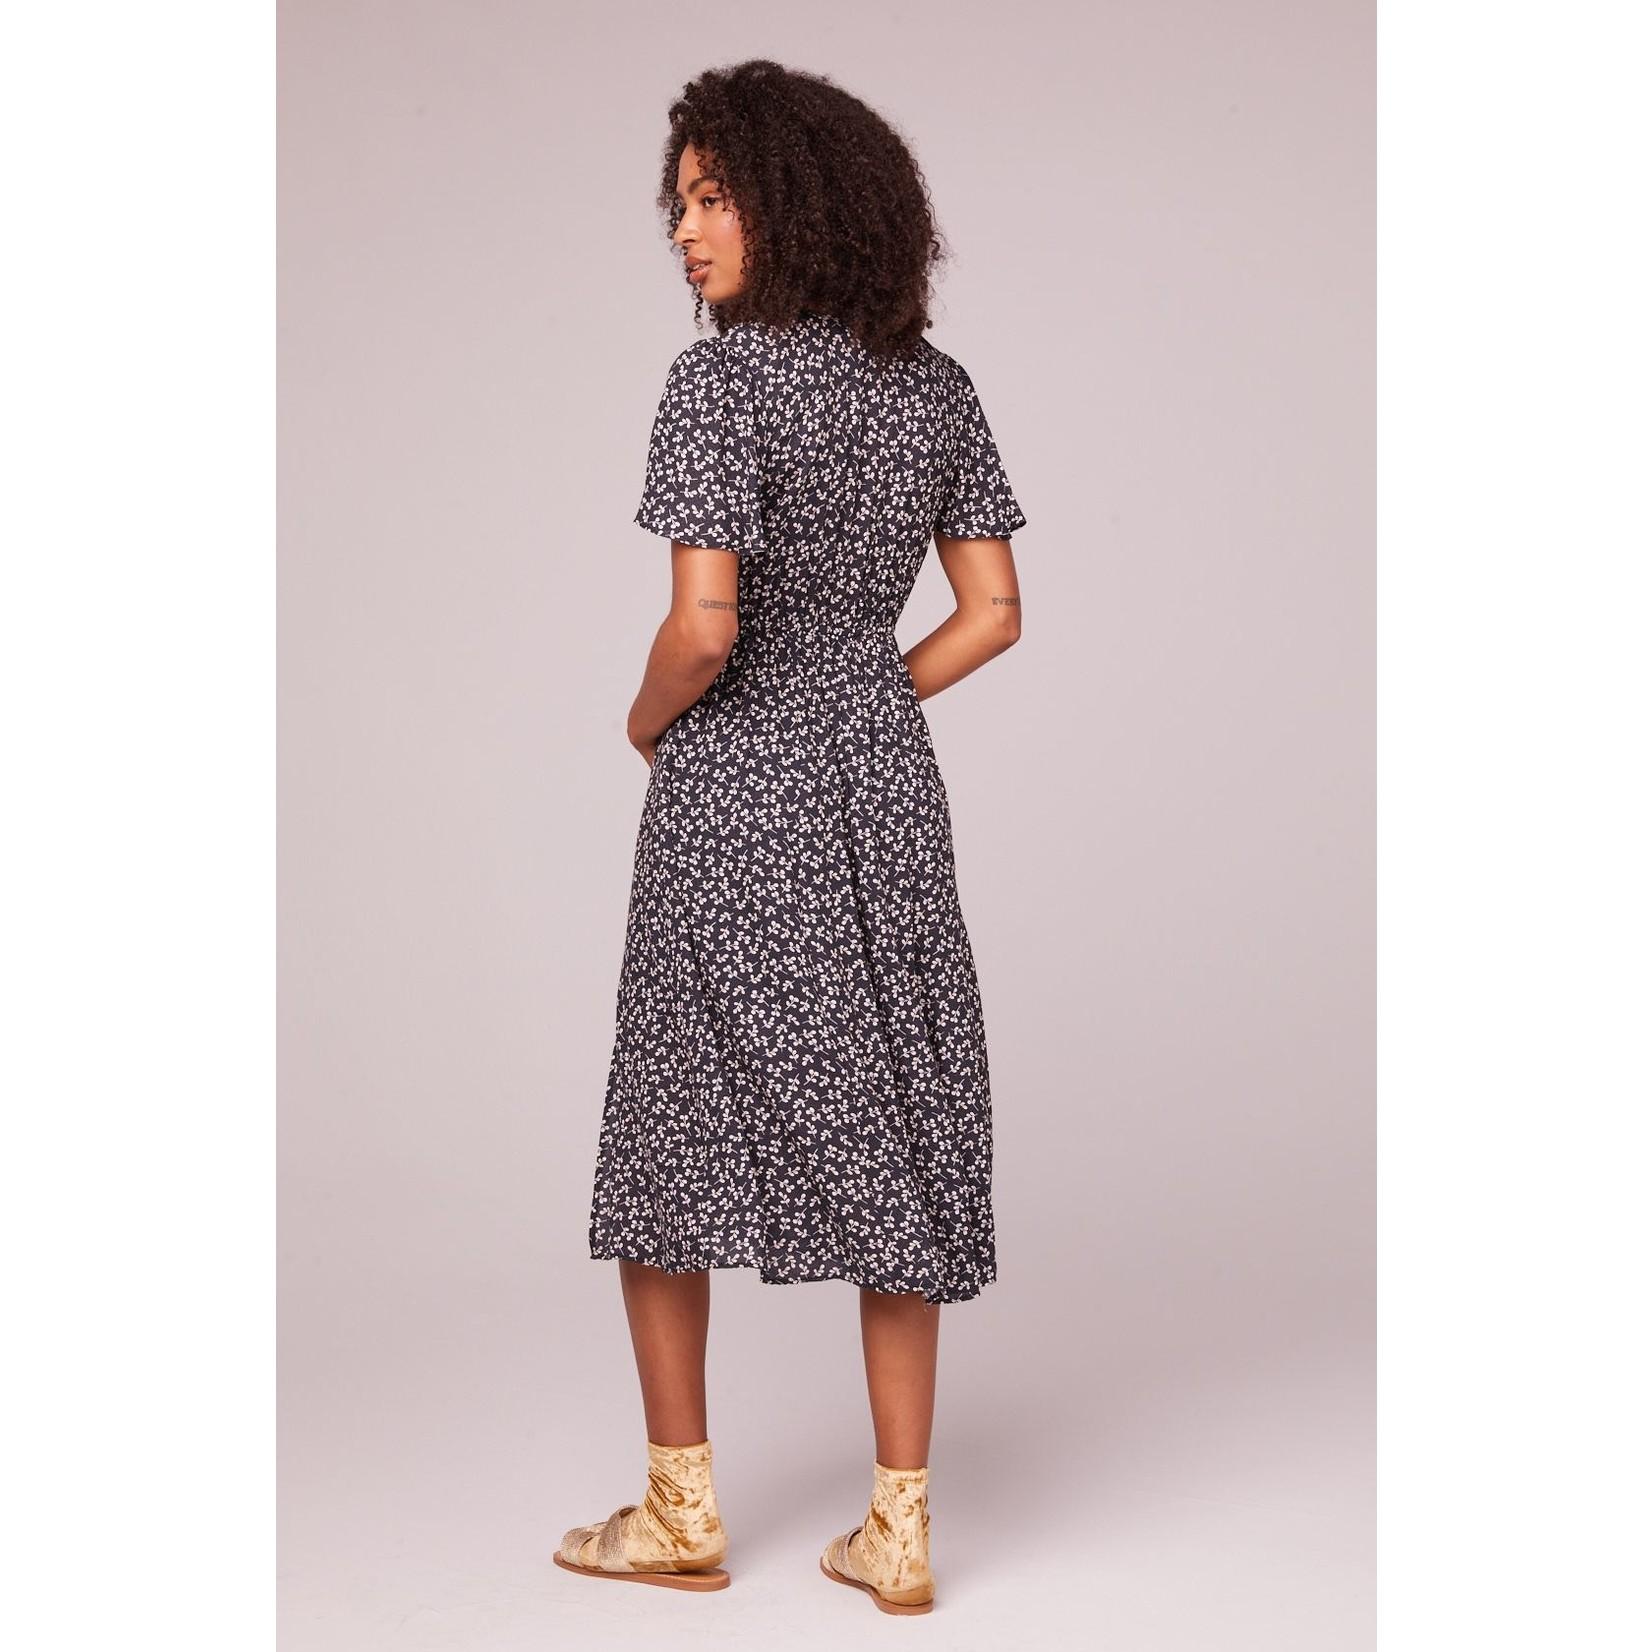 B.O.G. Collective Annabelle Dress